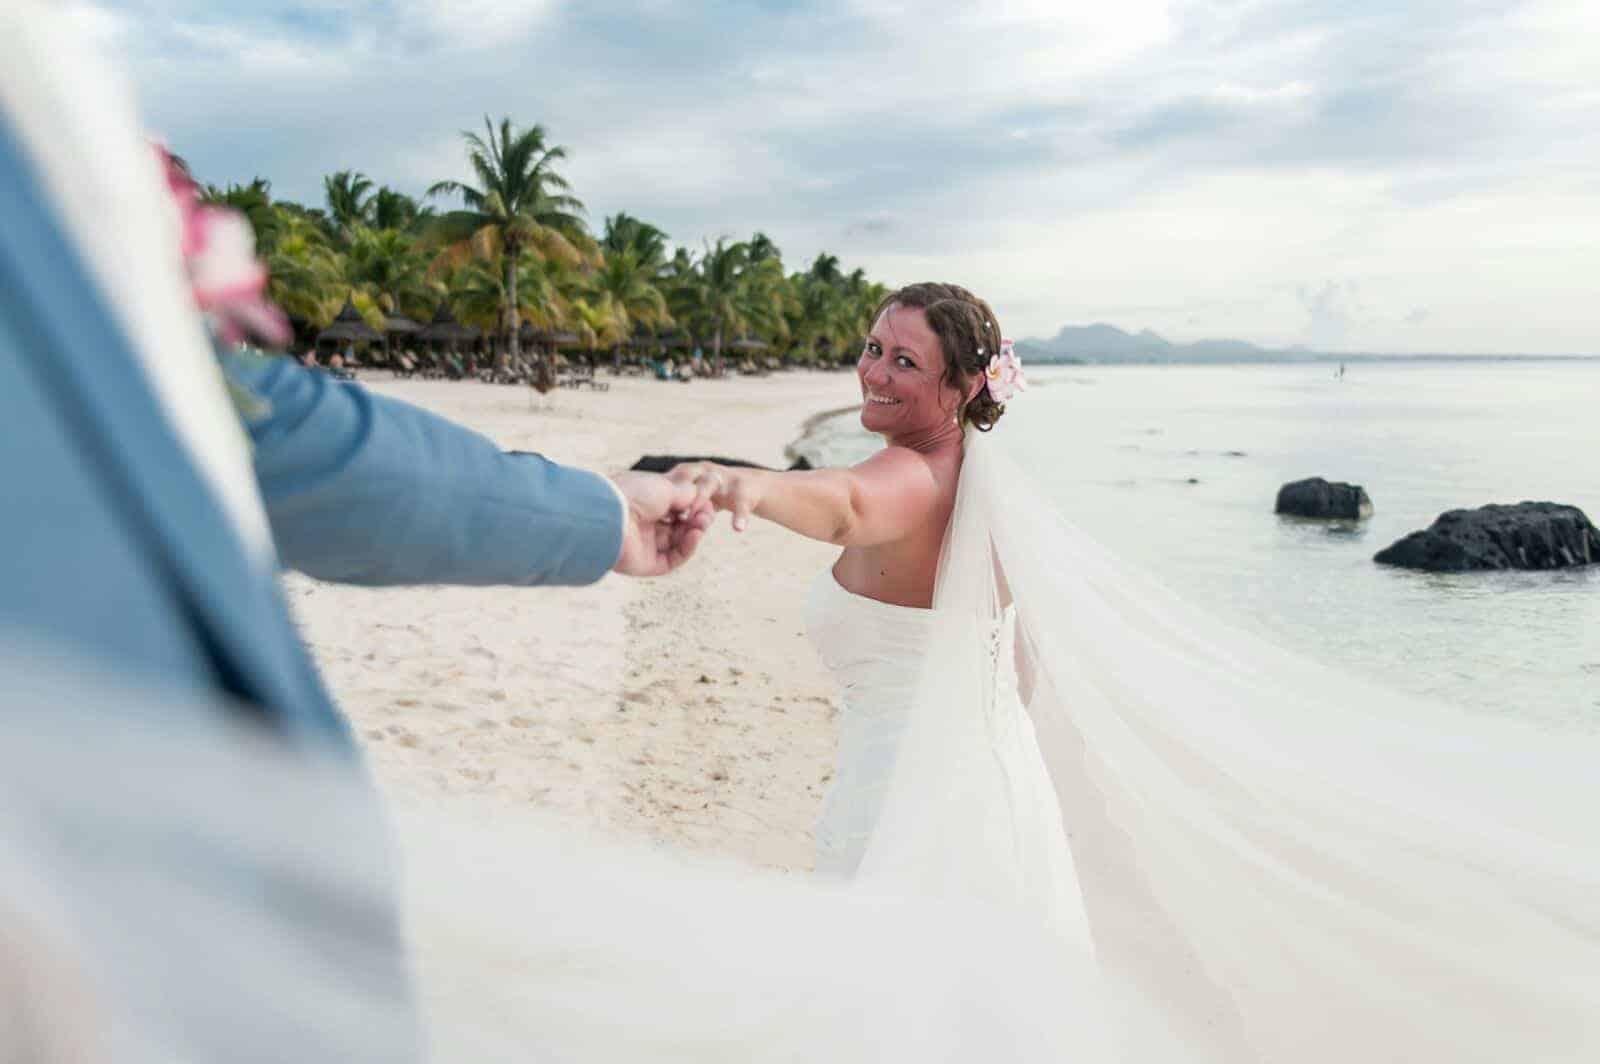 Ervaring_trouwen_Mauritius_Pascal_Silvia